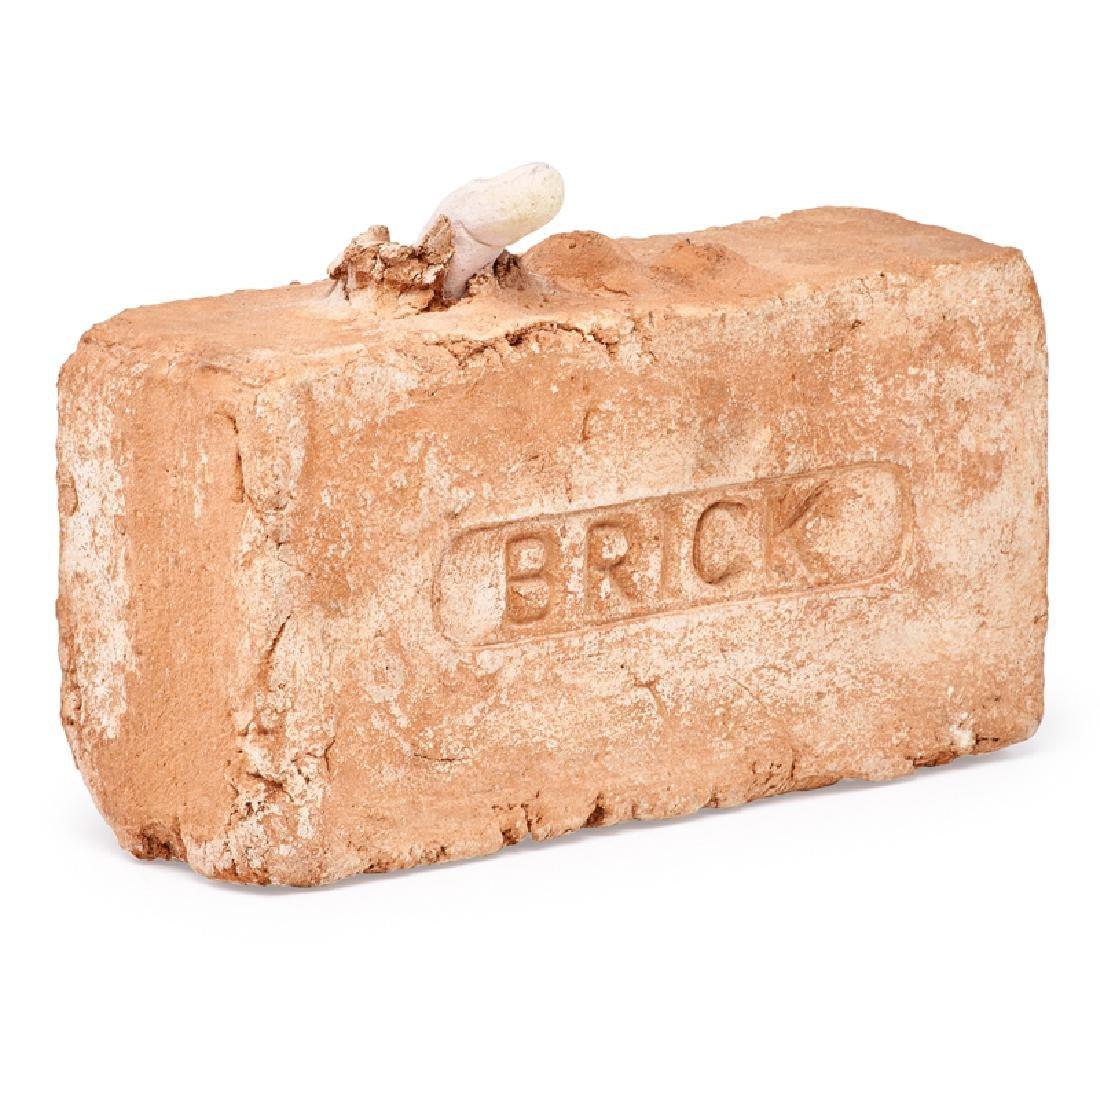 ROBERT ARNESON Brick sculpture